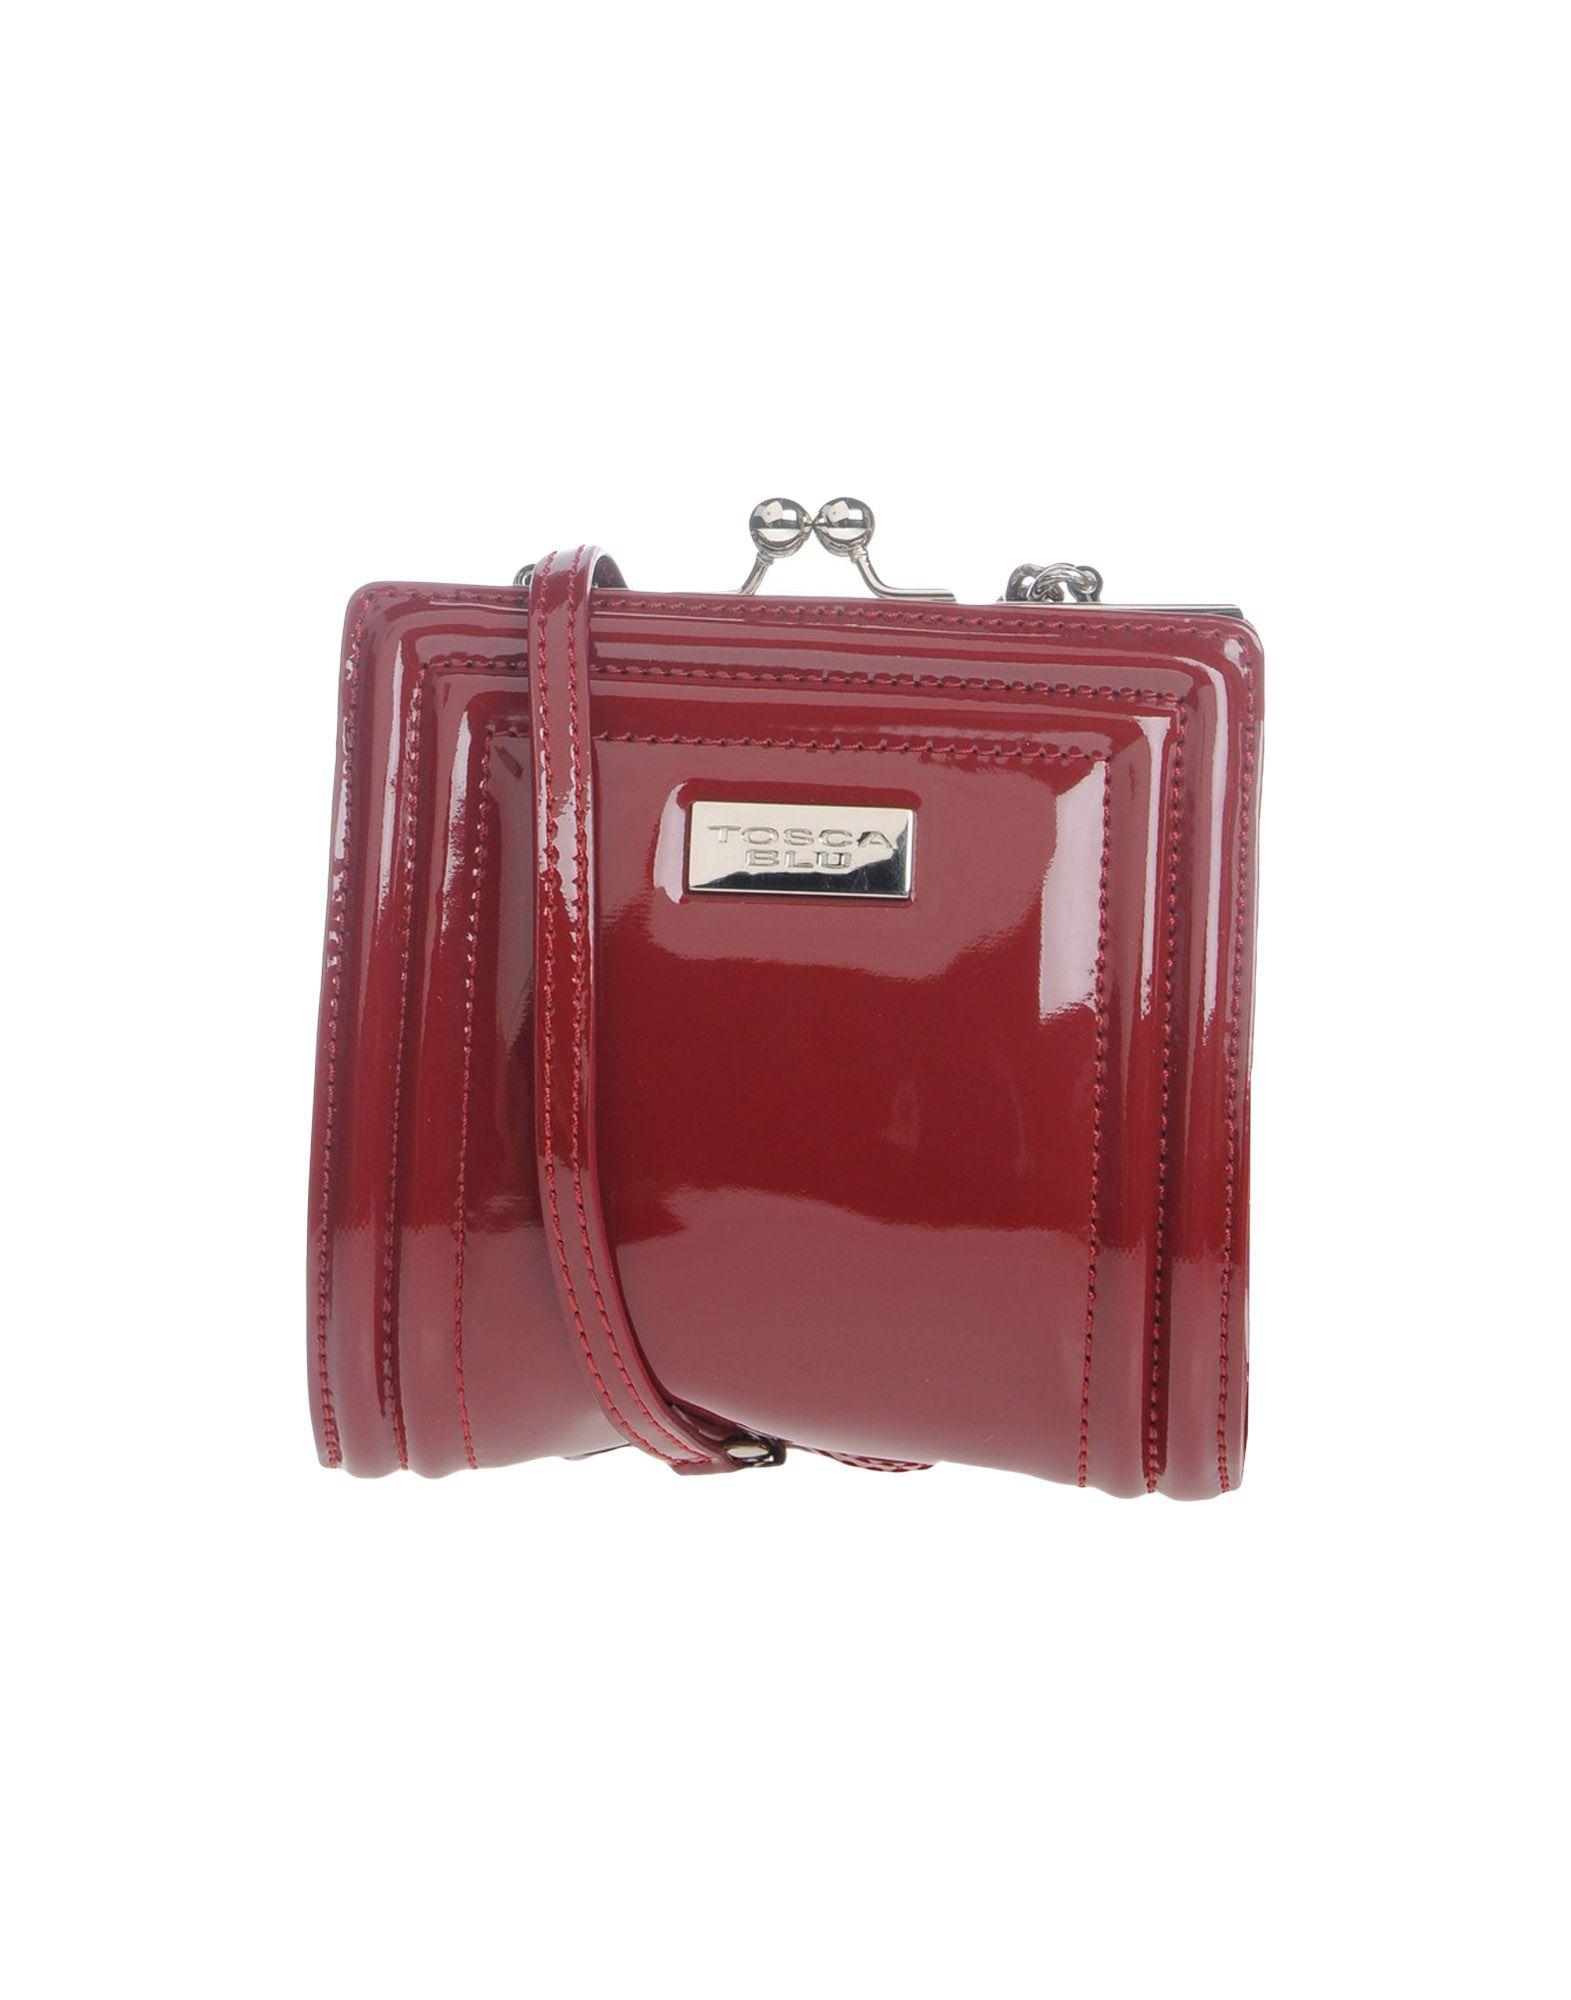 TOSCA BLU Сумка через плечо сумка через плечо famous brand 2015 pu zb 252